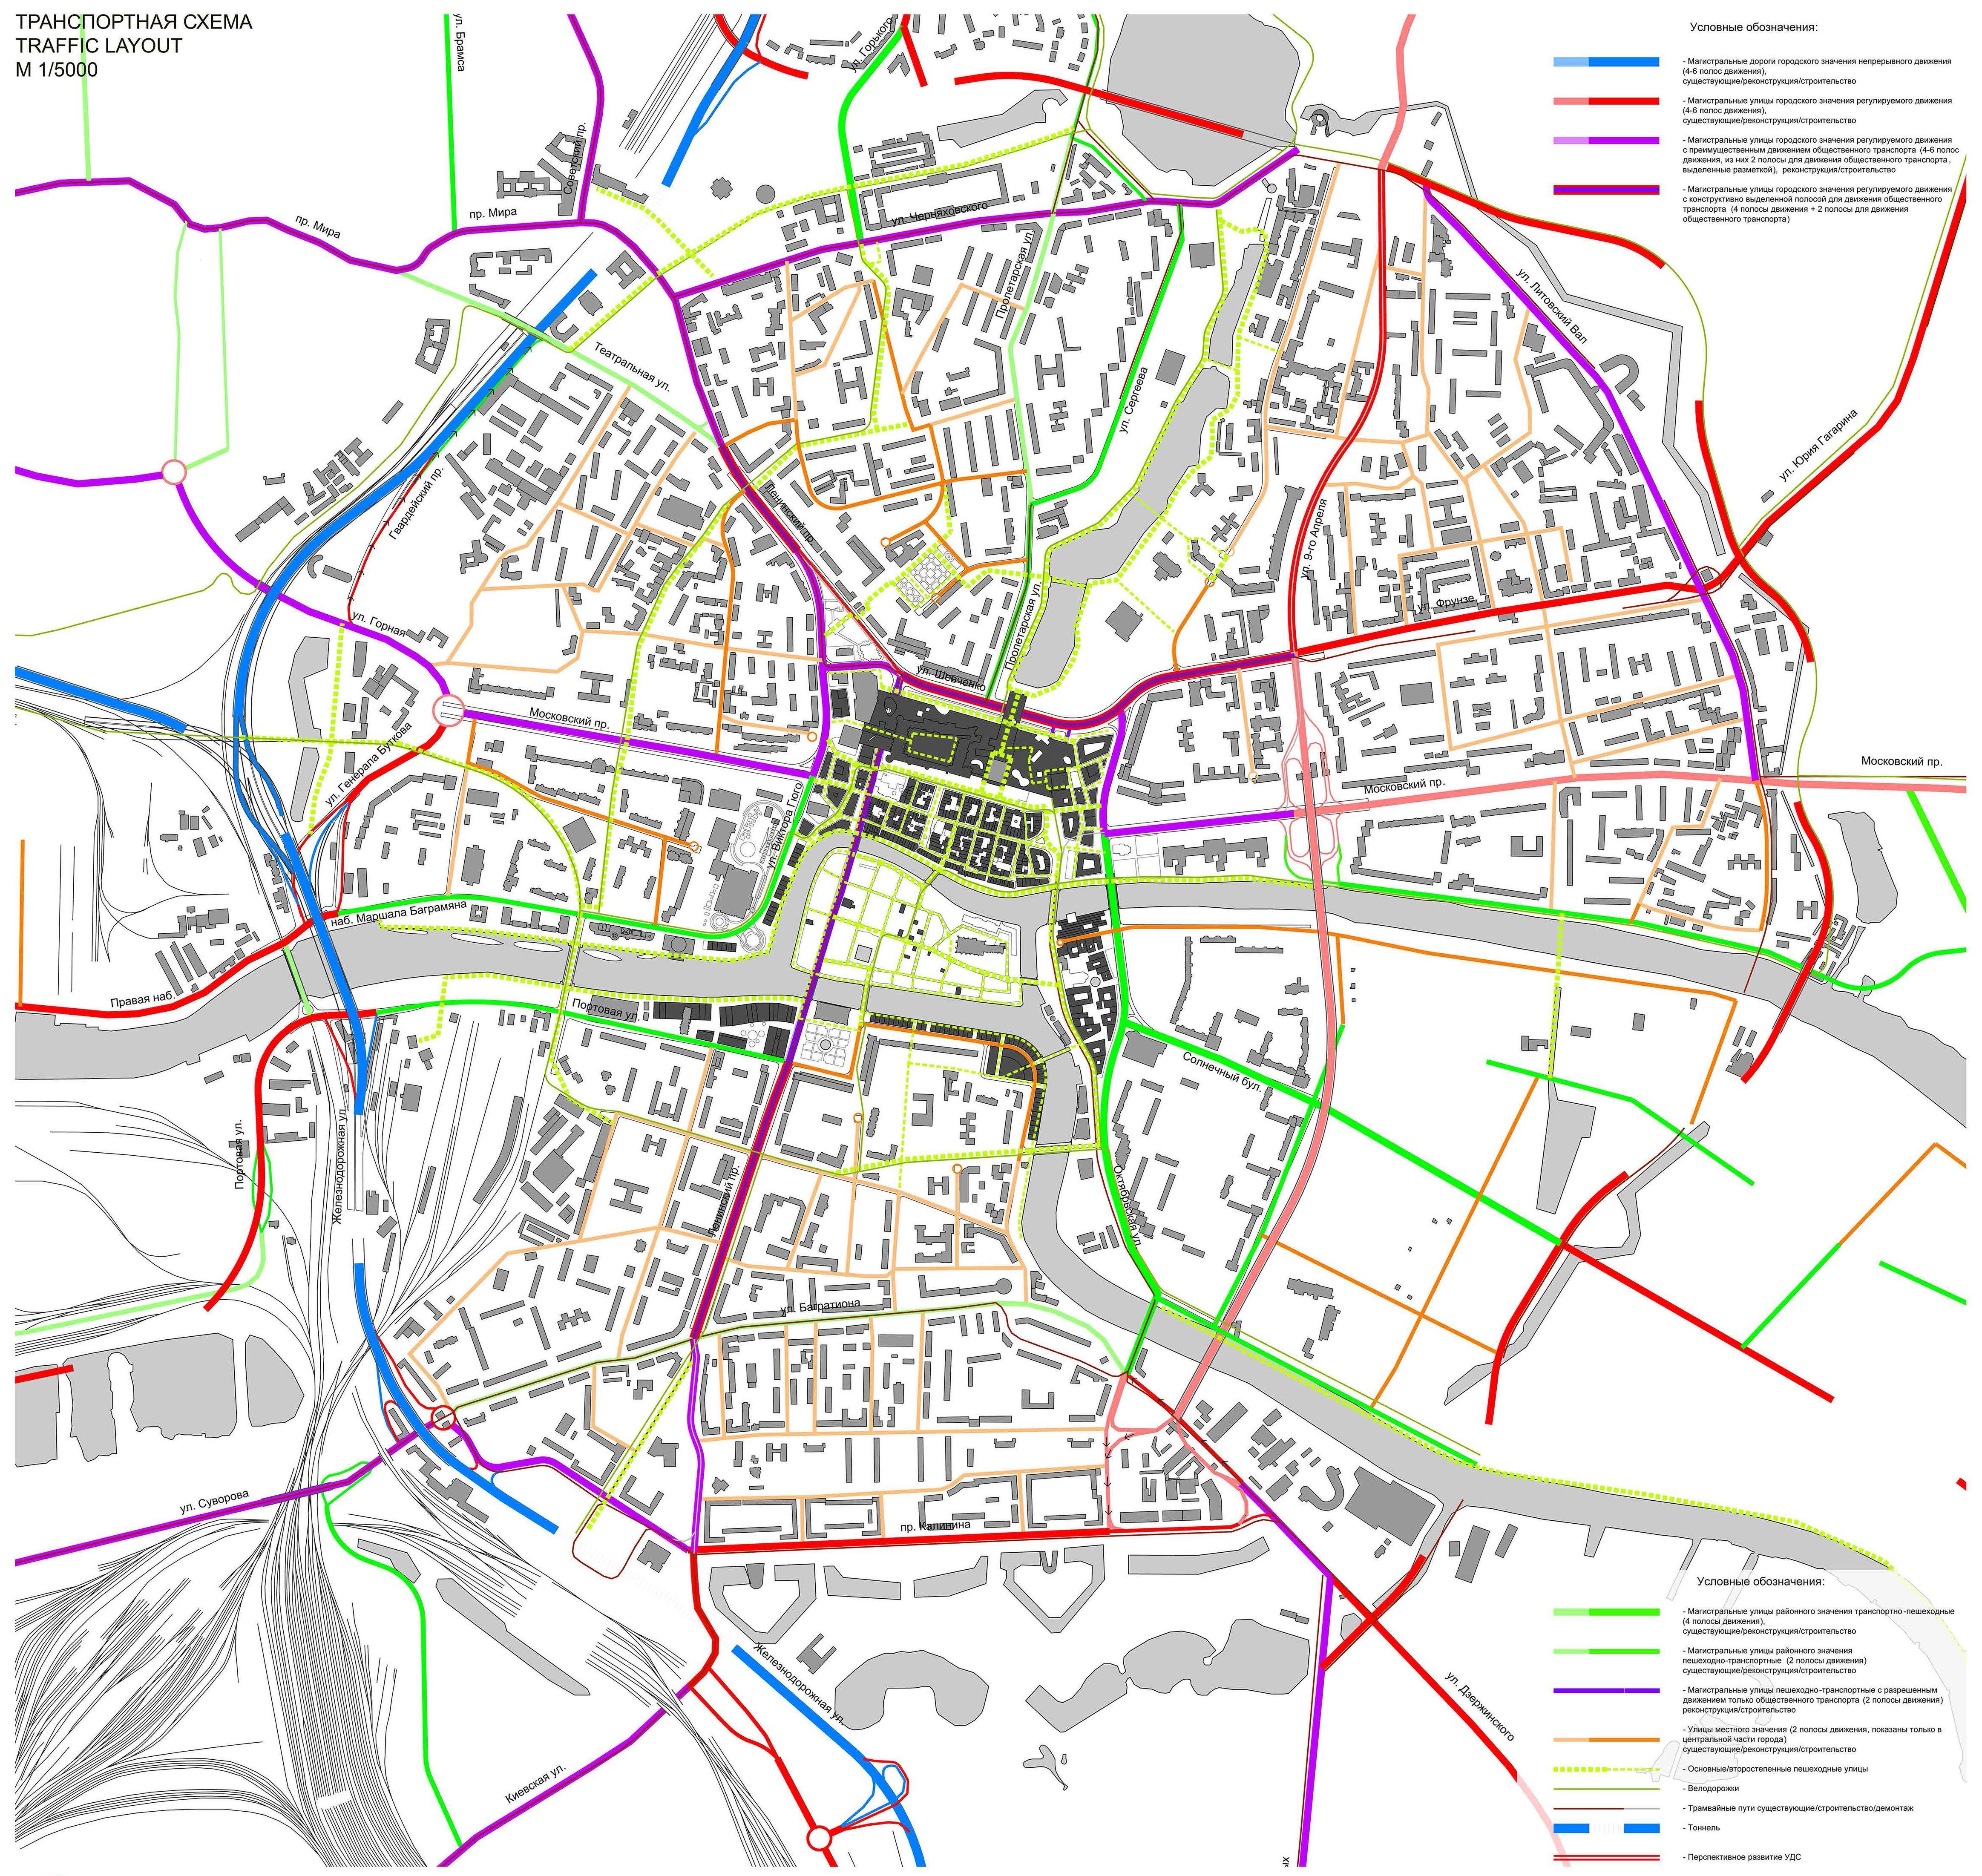 Карта схема города калининграда — livevideostudio.ru: http://livevideostudio.ru/%d0%b1%d0%b5%d0%b7-%d1%80%d1%83%d0%b1%d1%80%d0%b8%d0%ba%d0%b8/26765-karta-sxema-goroda-kaliningrada